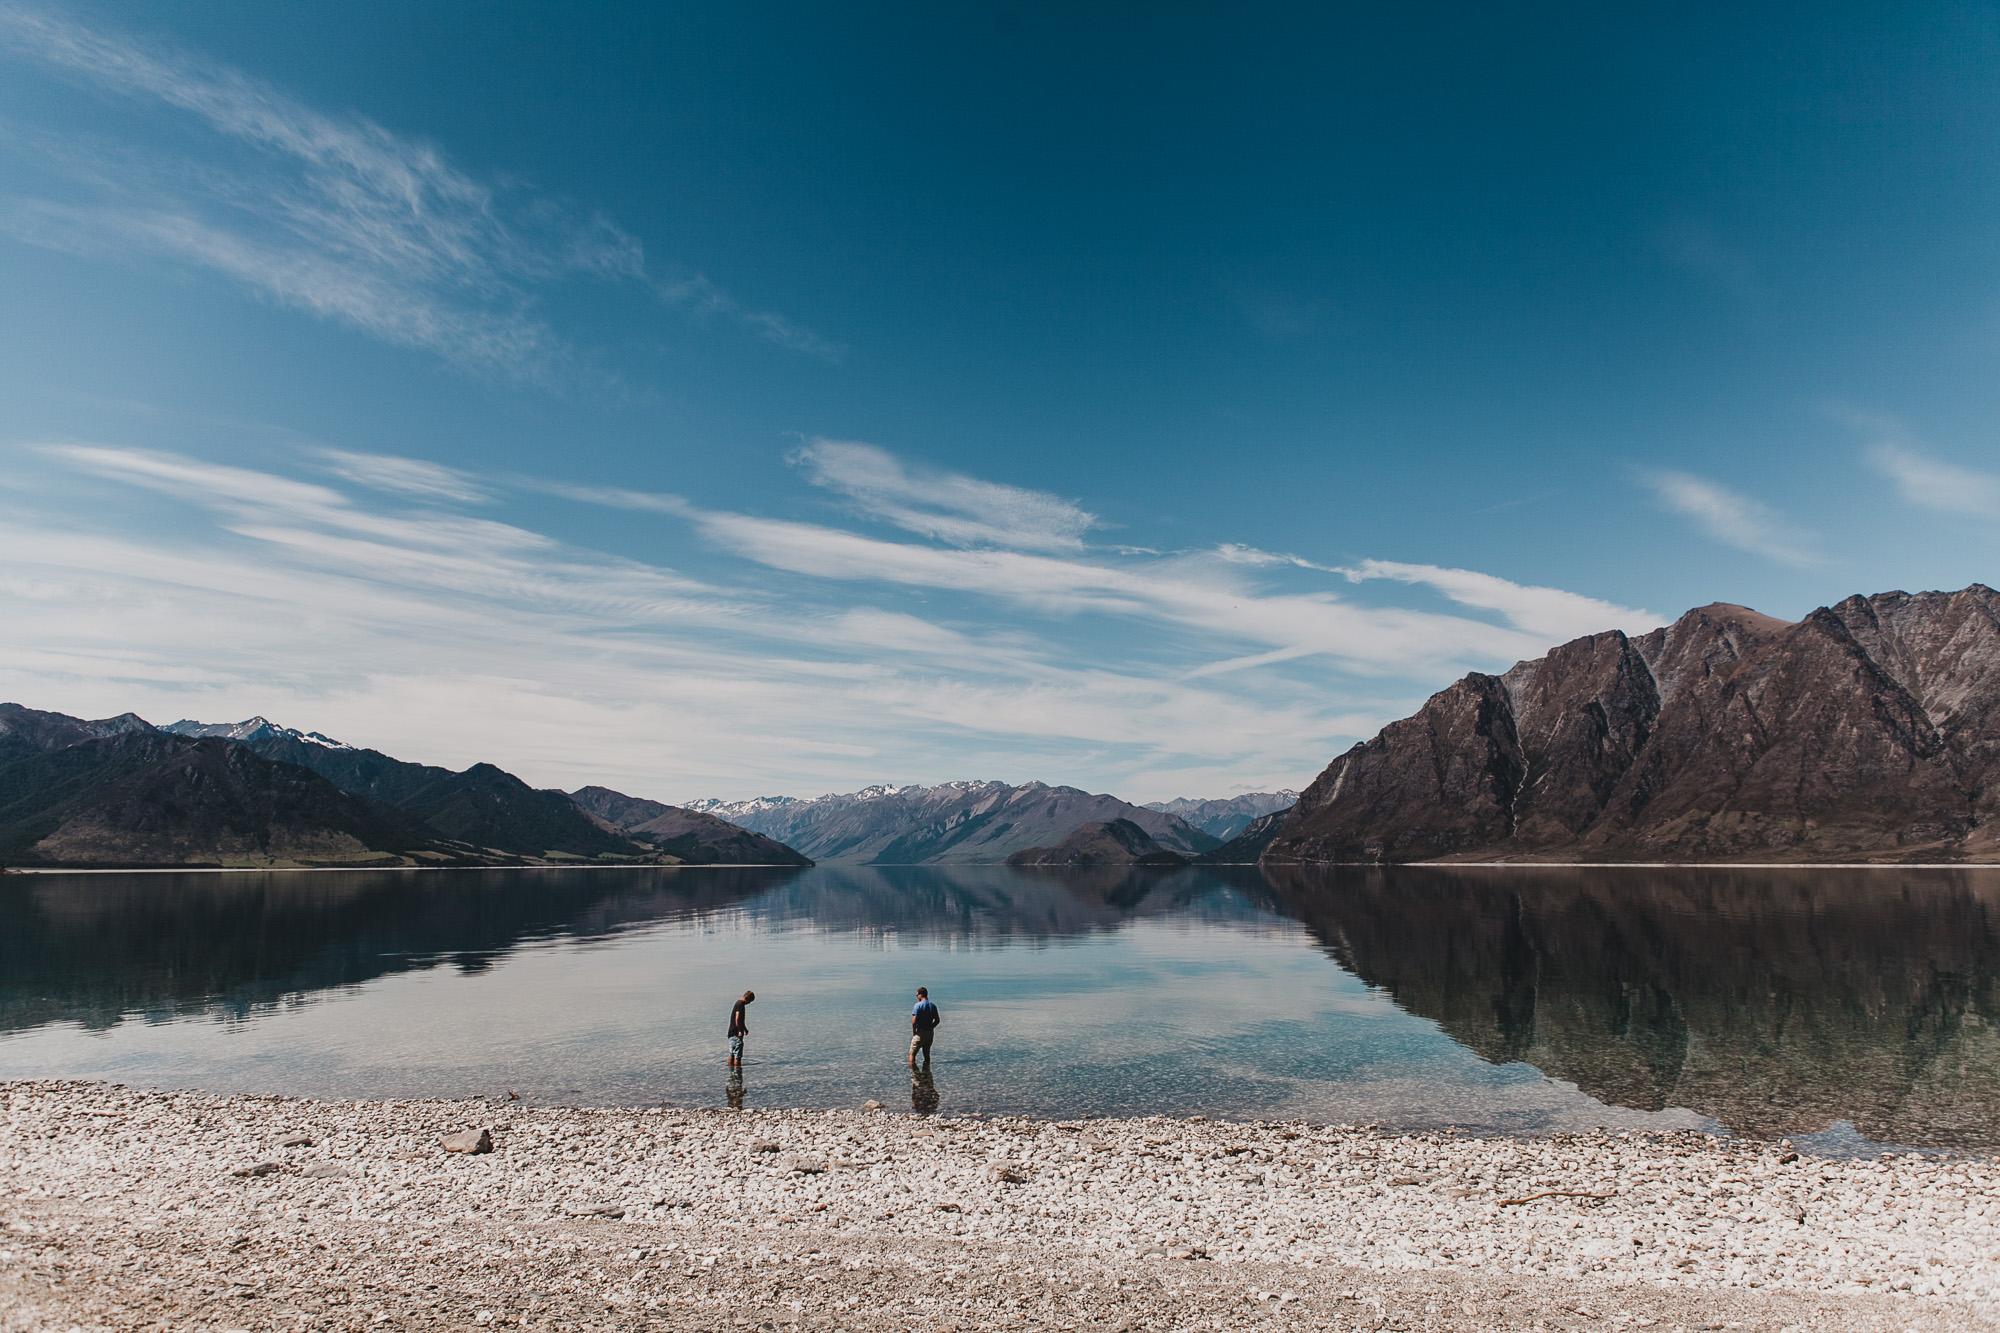 lake-hawea-new-zealand-001.jpg